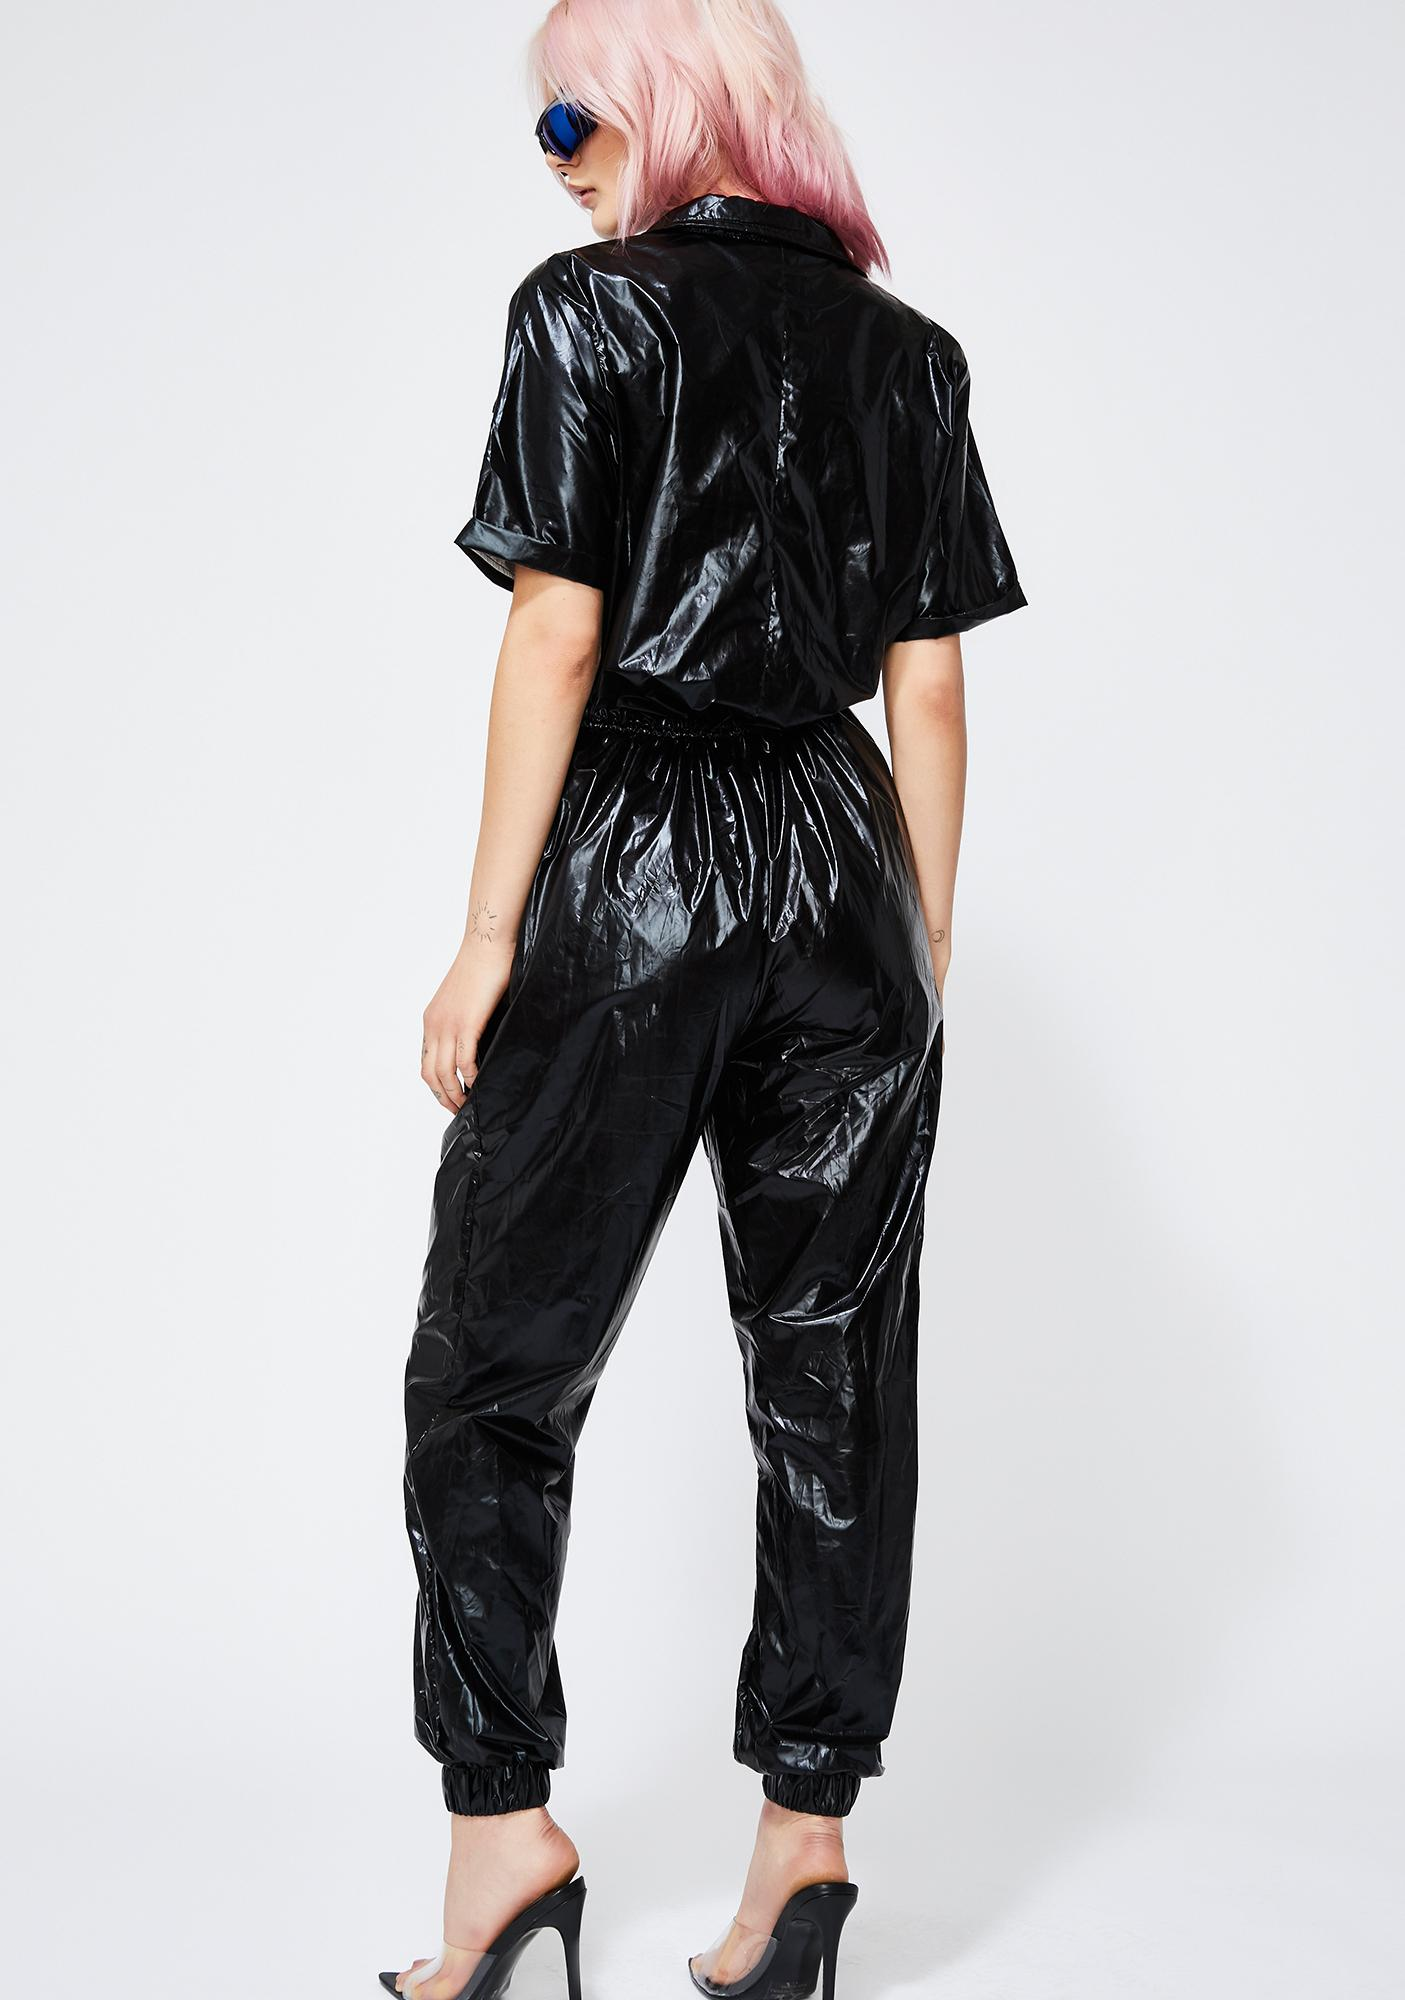 Onyx Chroma Collision Metallic Jumpsuit